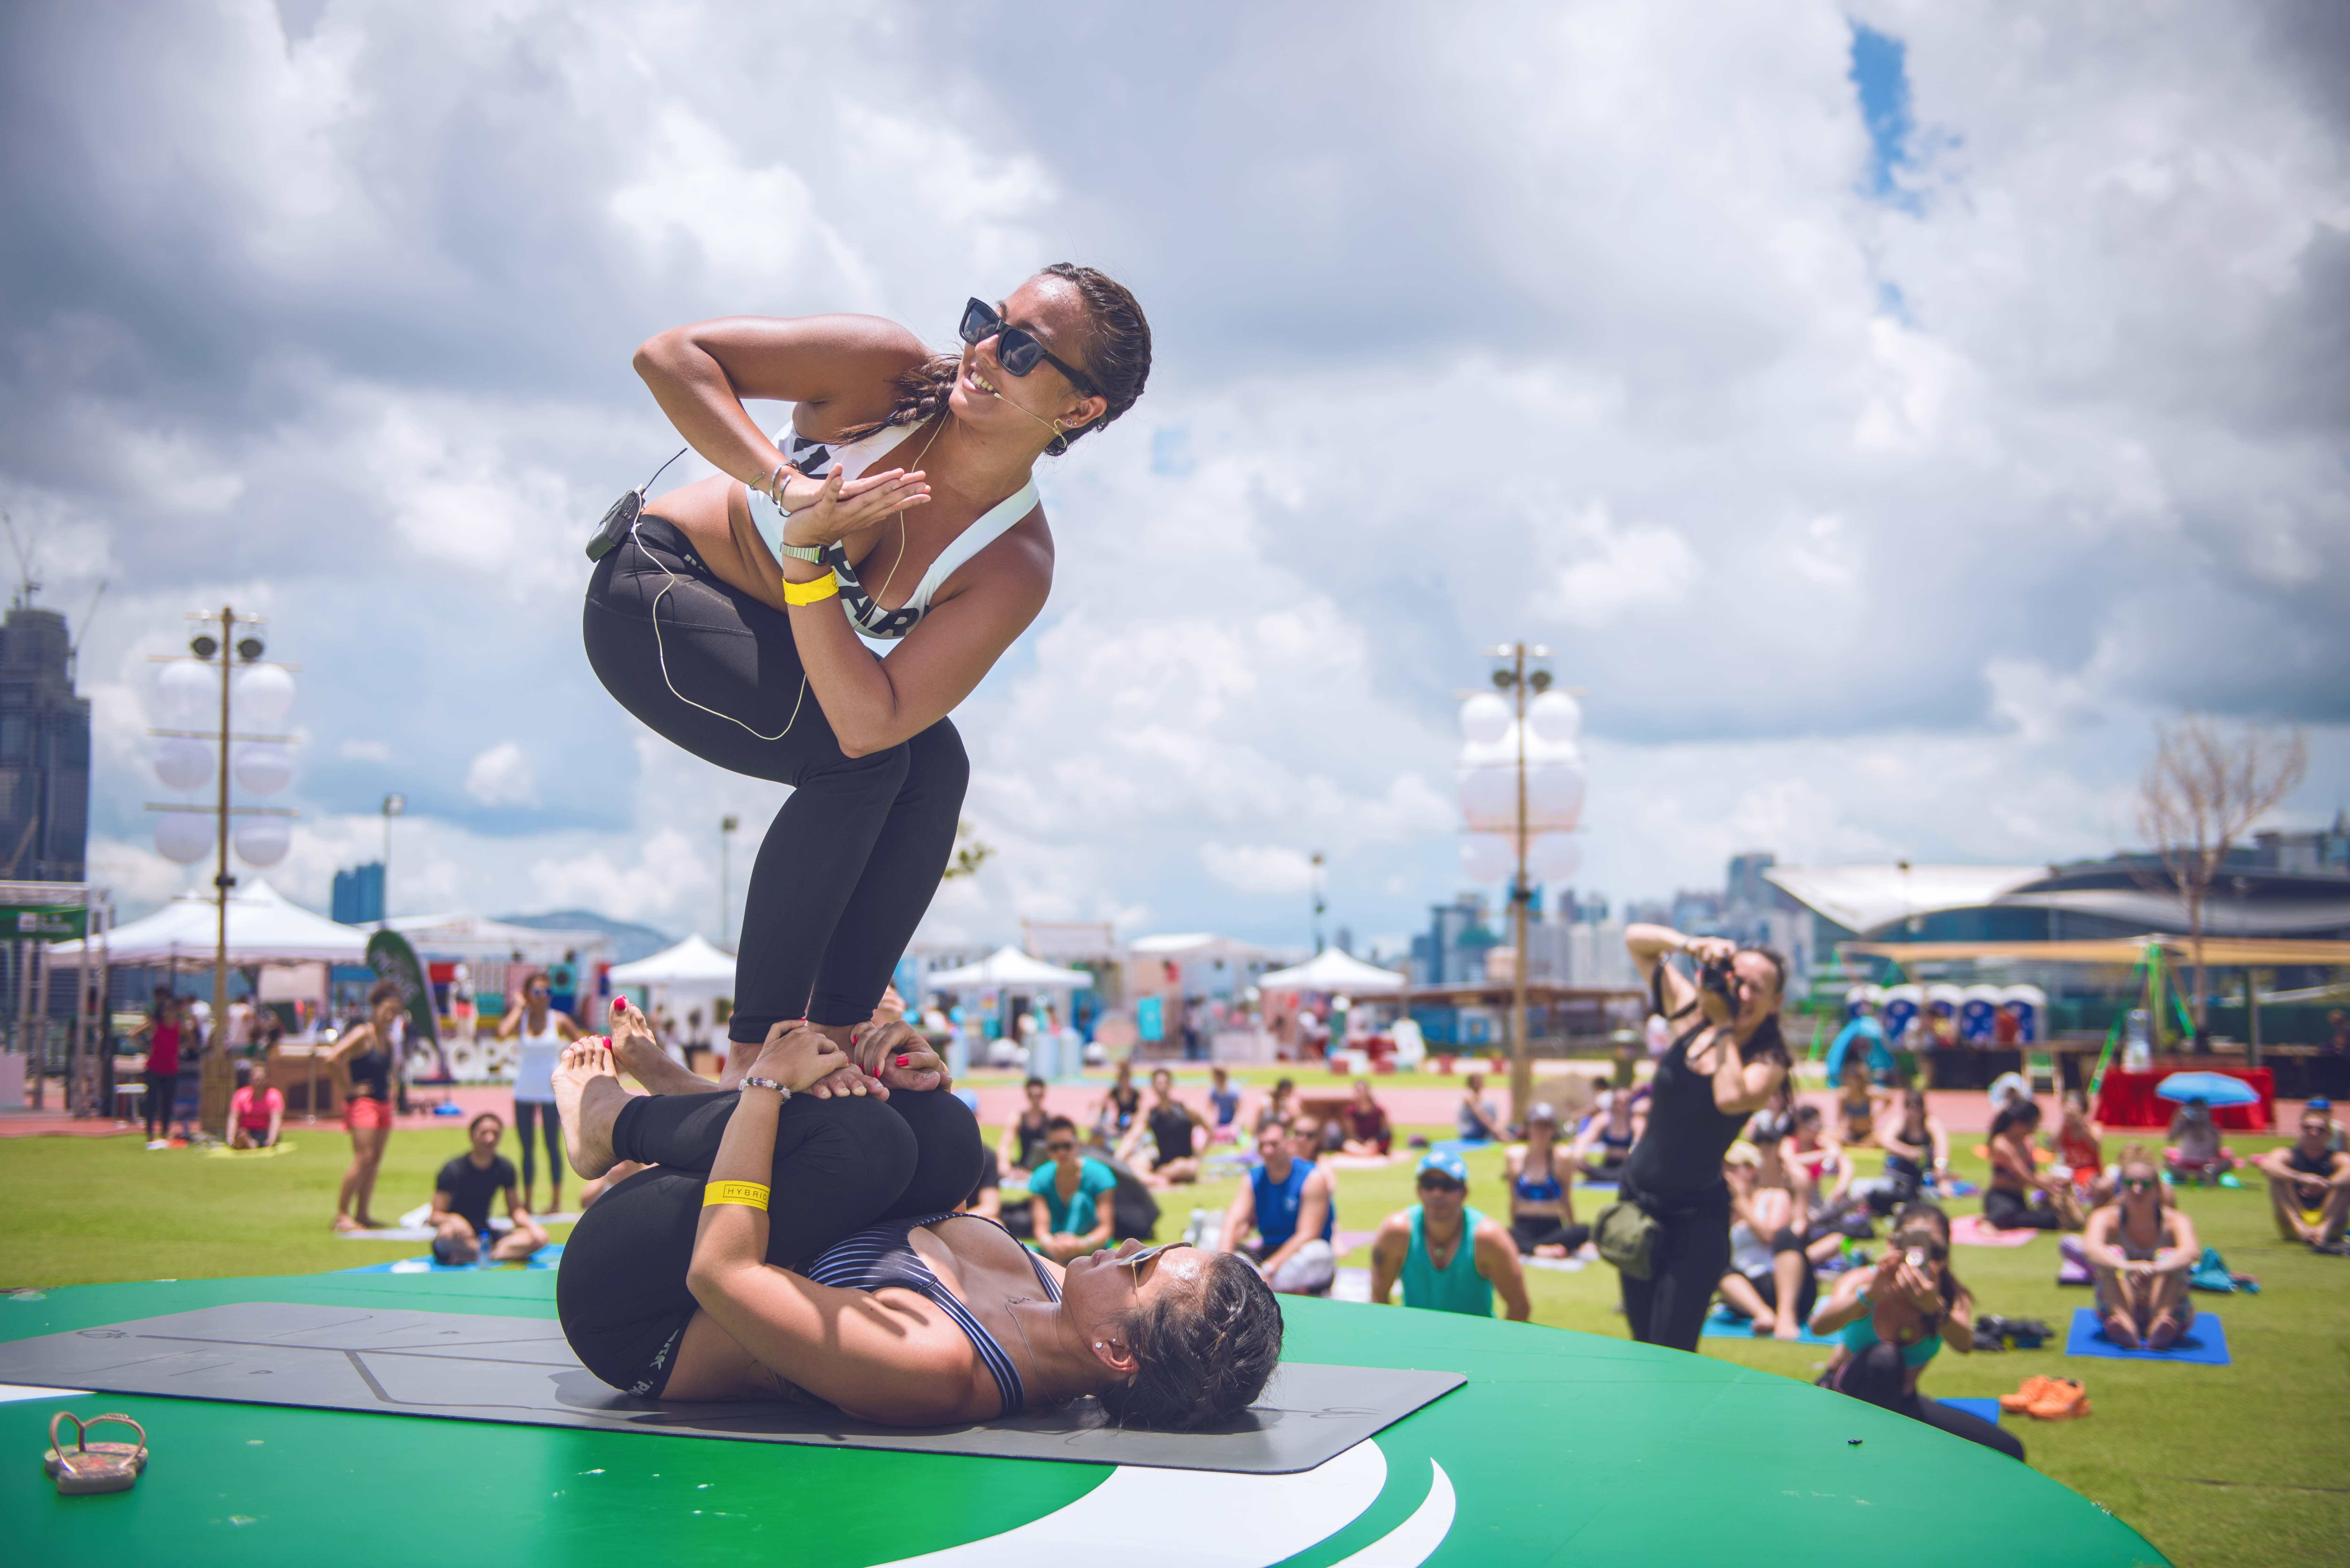 Acro Yoga & K11 Natural Refreshments Tour - WELLNESS - K11